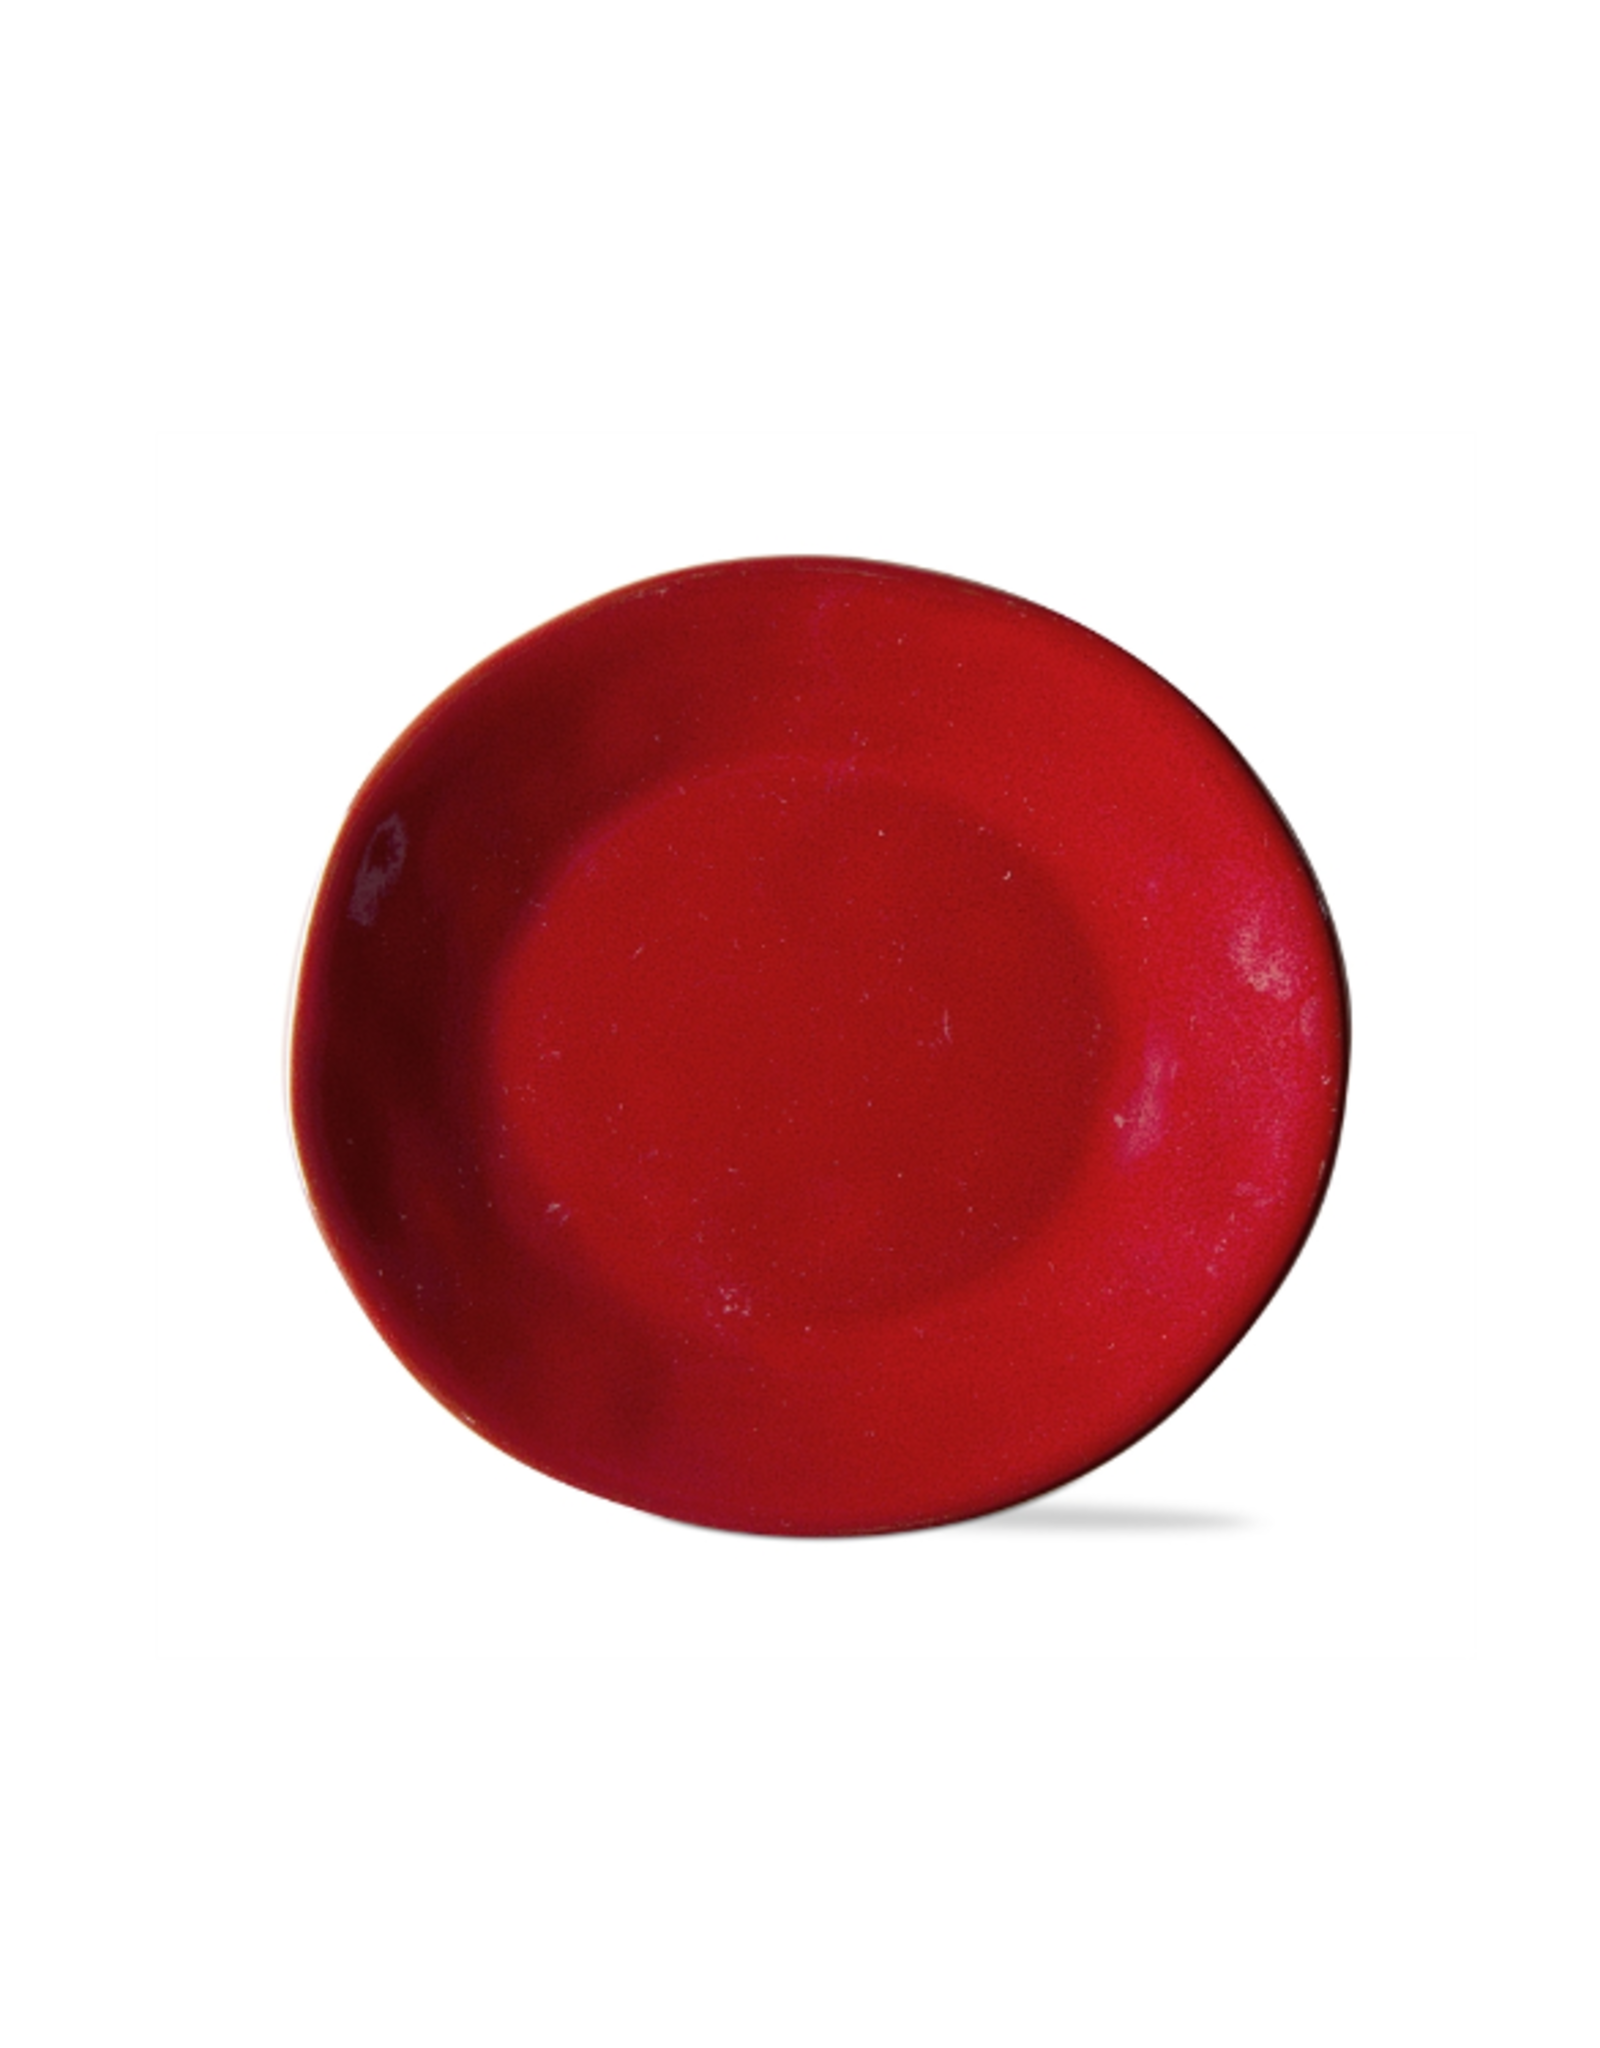 Tag Appetizer Plate, Soho Glaze Red